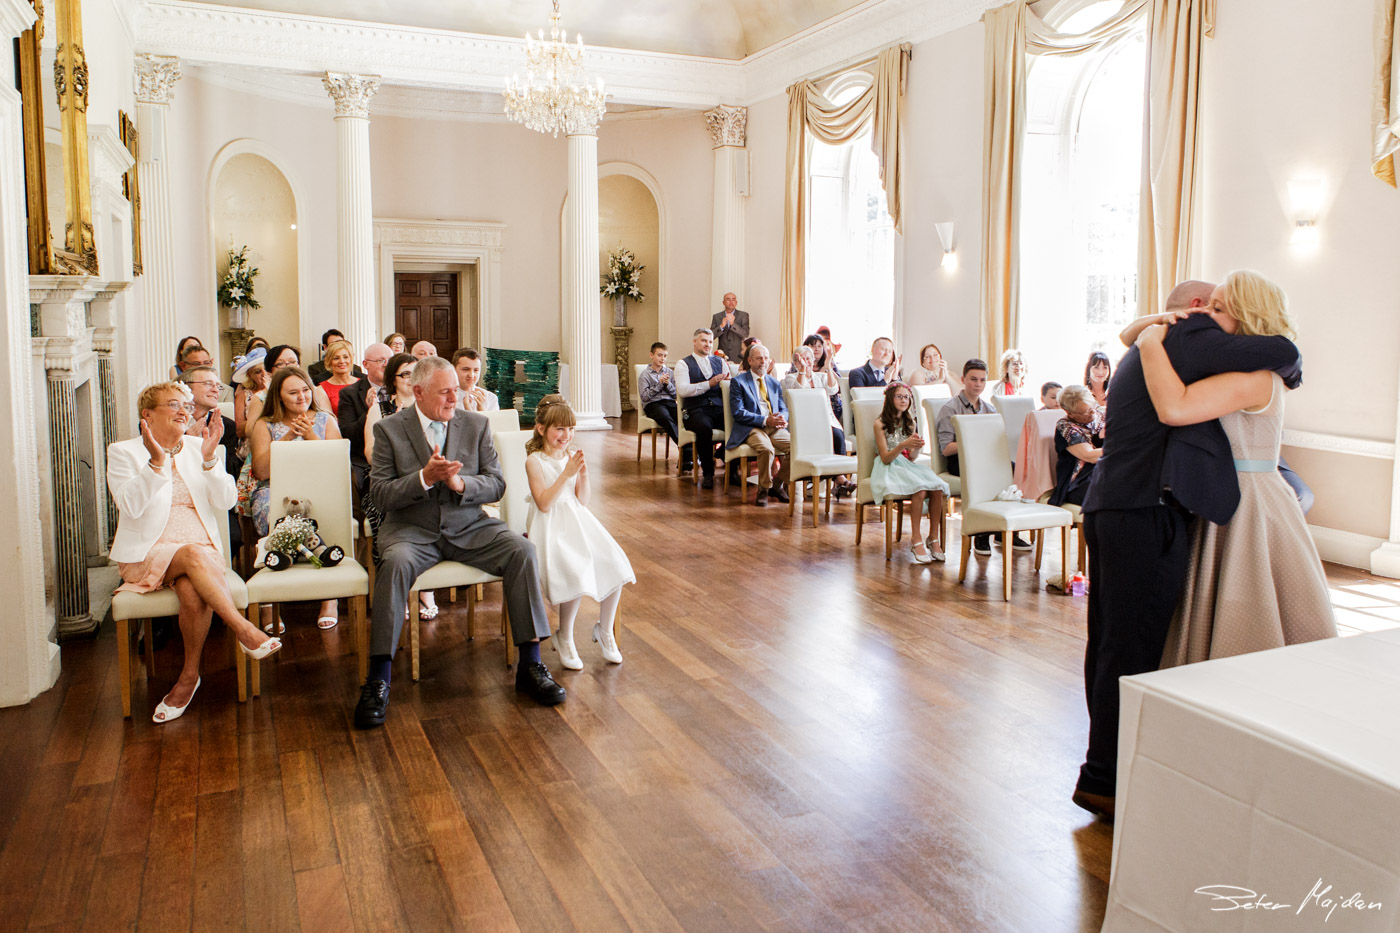 Colwick-hall-wedding-photography-23.jpg